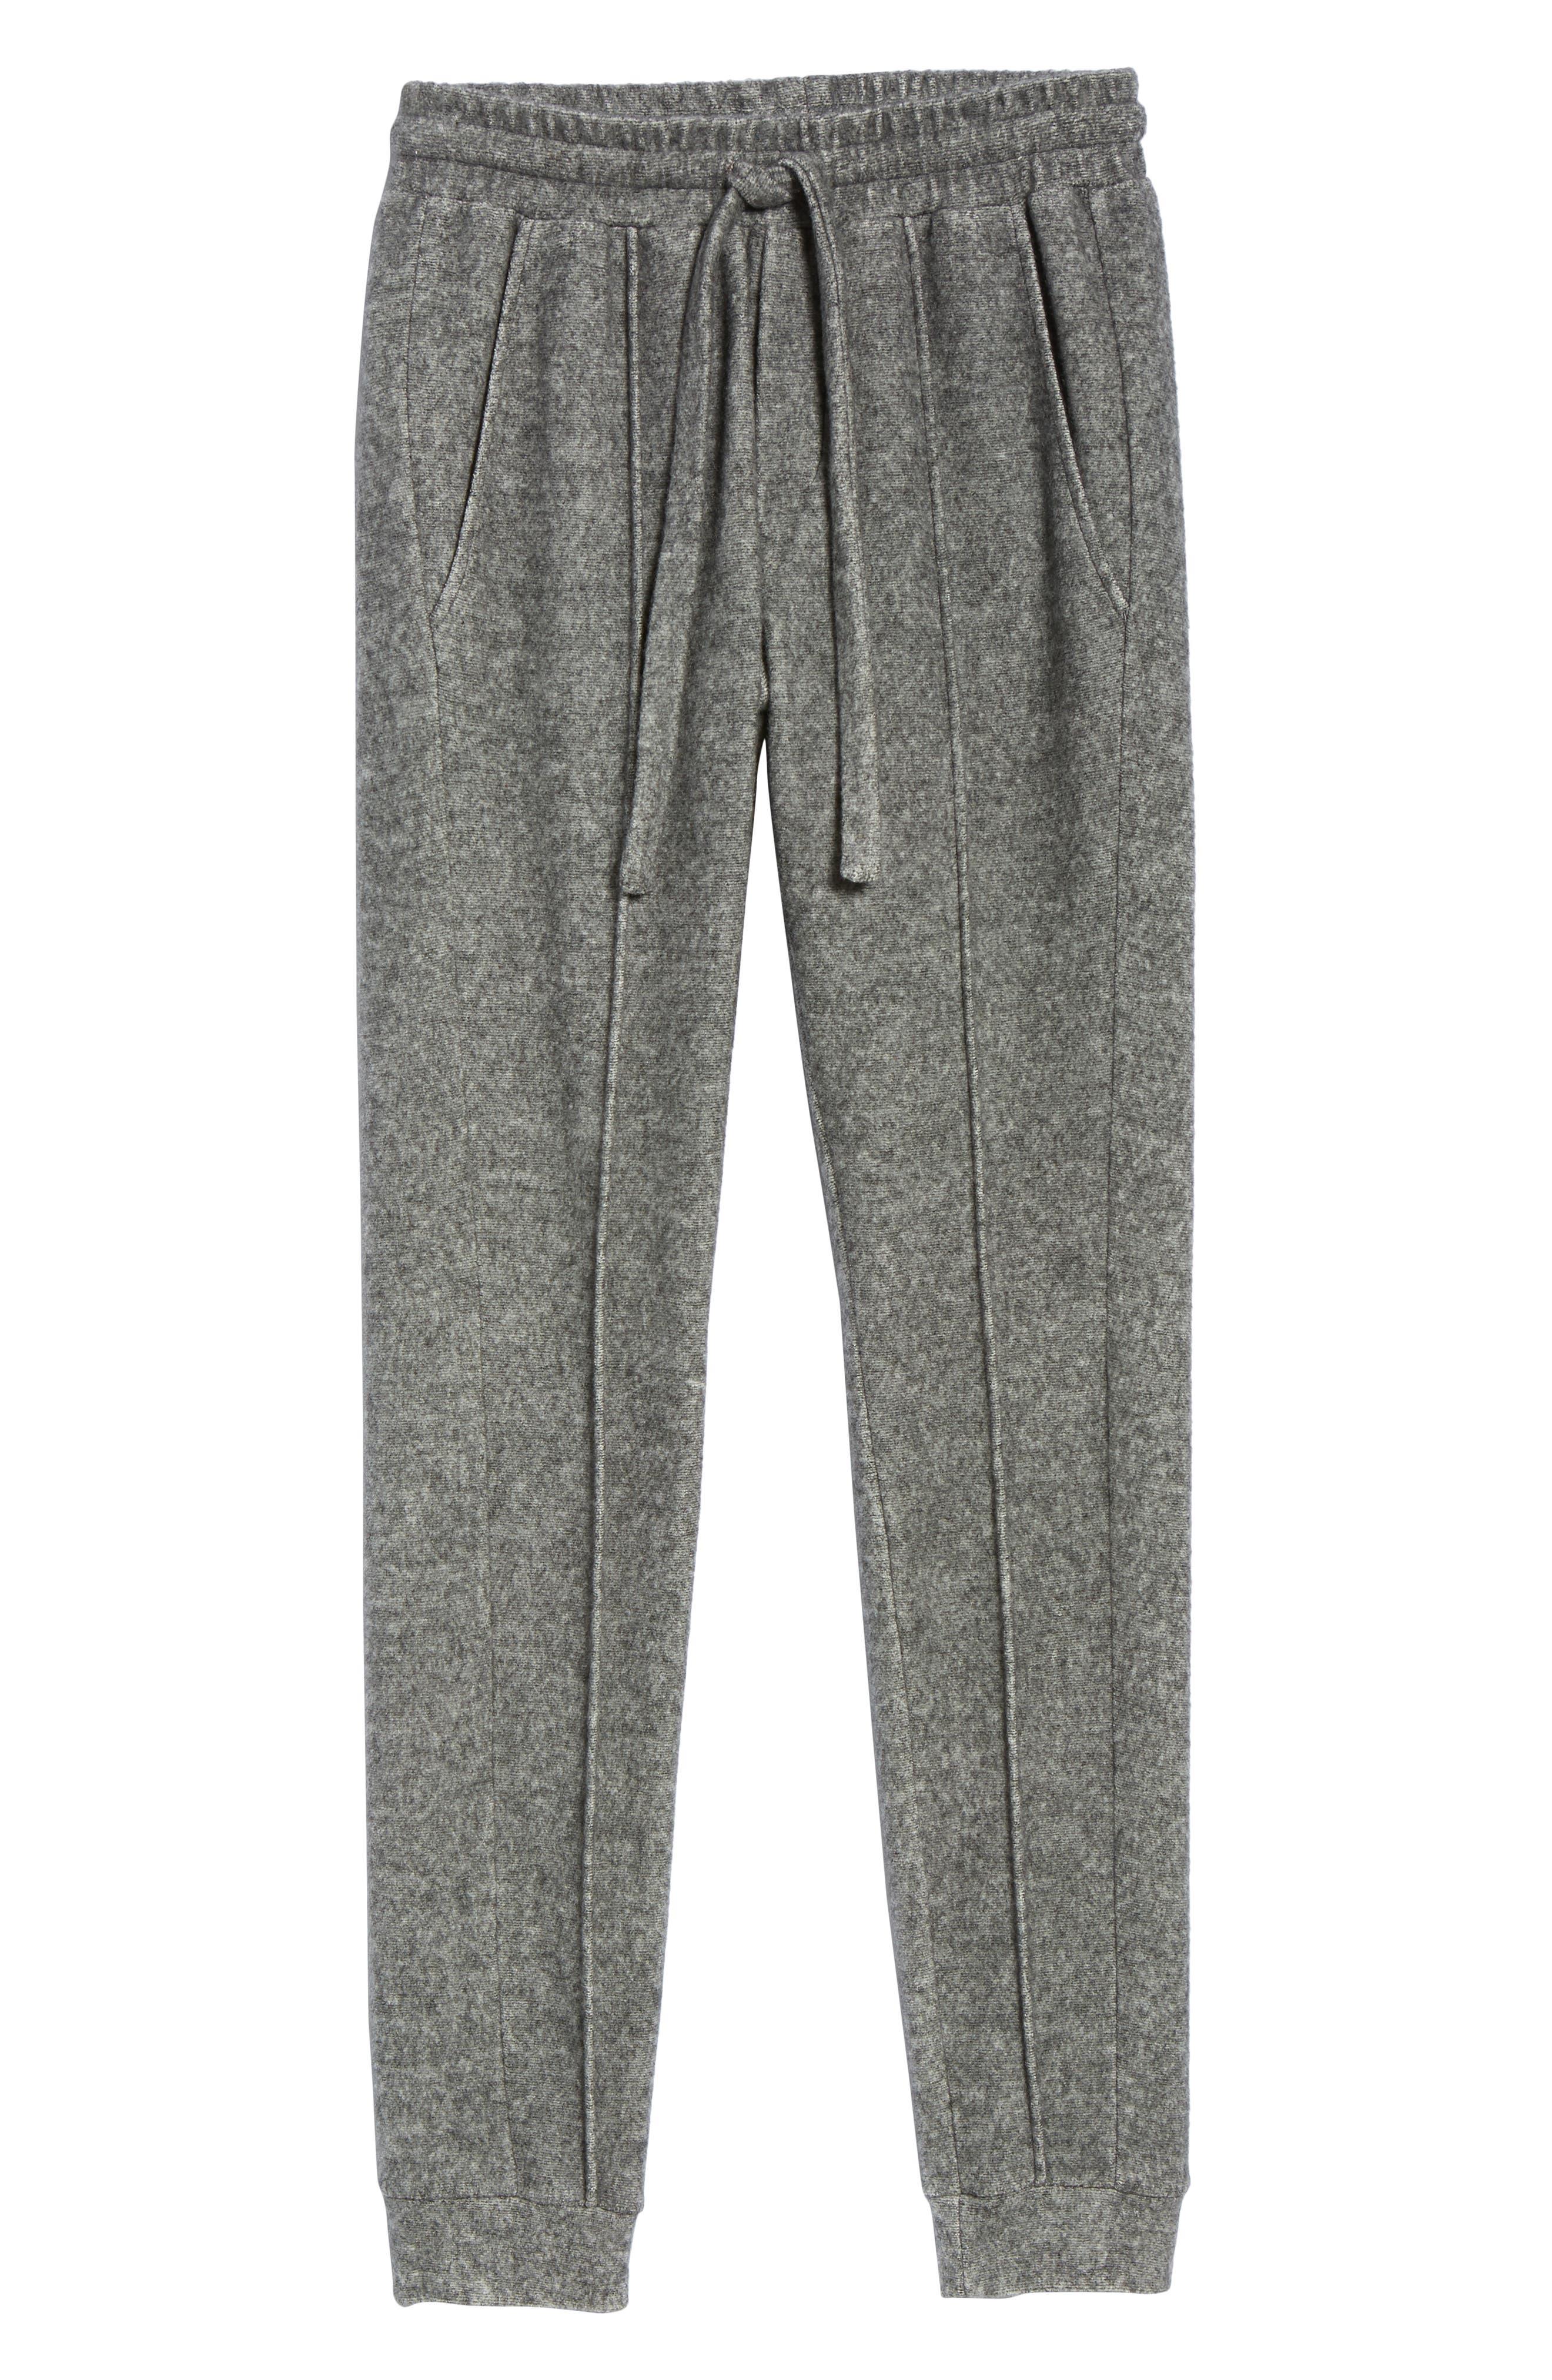 Maddux Slim Fit Jogger Pants,                             Alternate thumbnail 6, color,                             HEATHER GREY